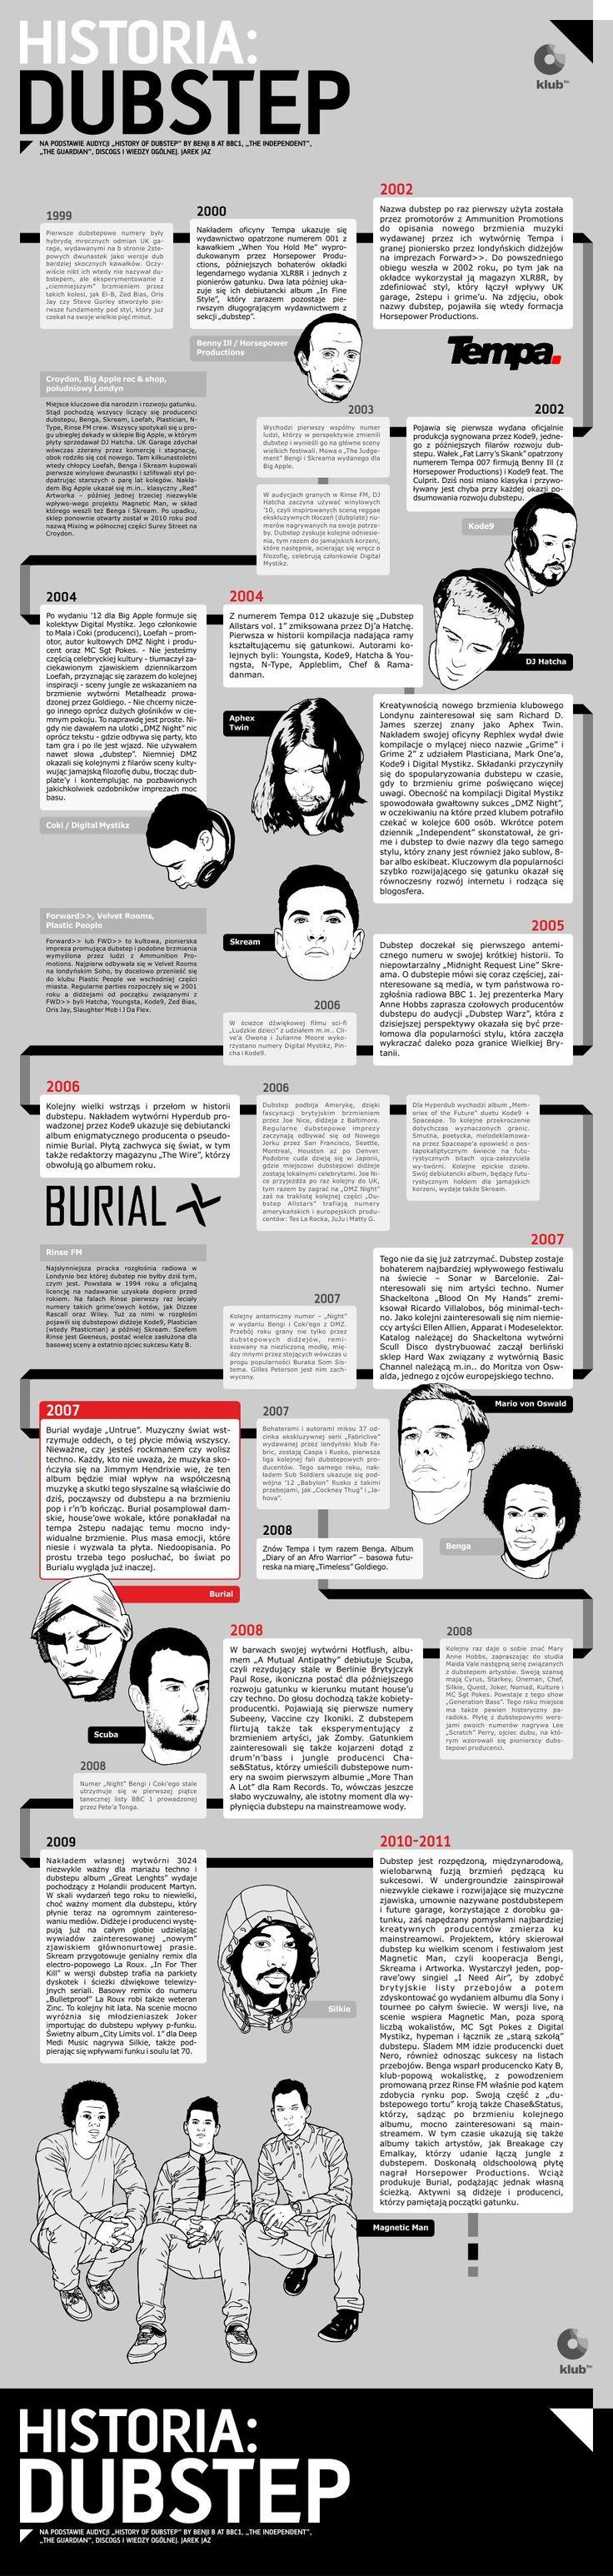 Historia: Dubstep (Infografika: Jarek Jaz i Dominik Bułka)   klub.fm – Klub Zdobywców Biletów